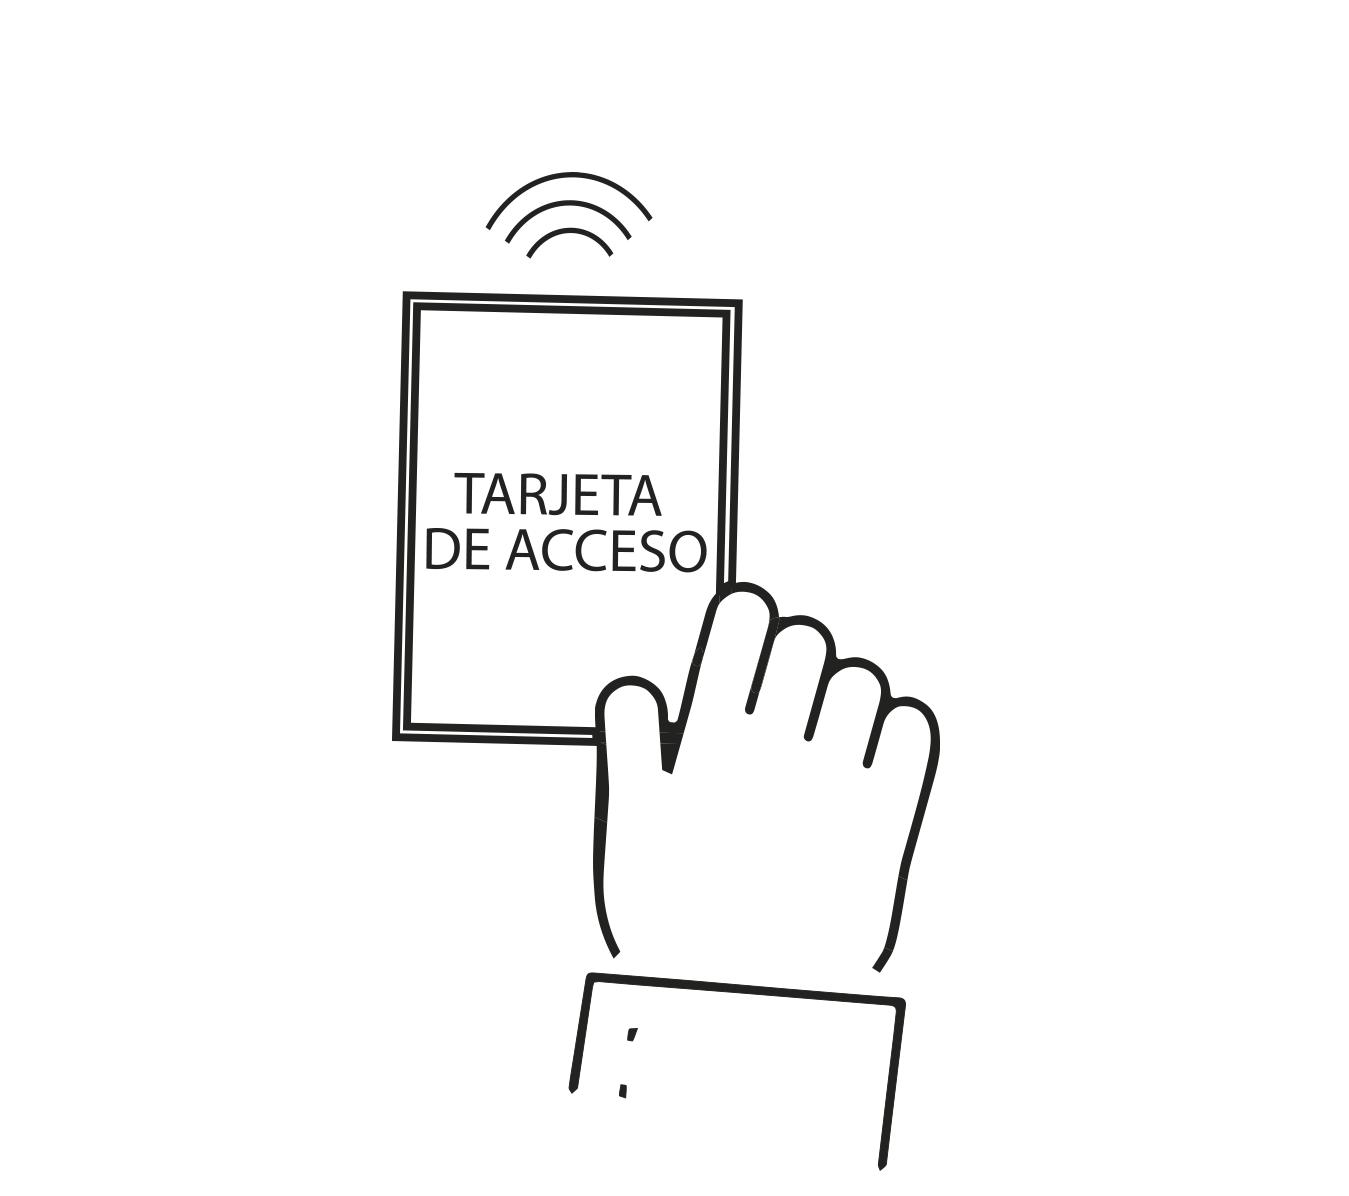 dibujo tarjeta acceso magnética